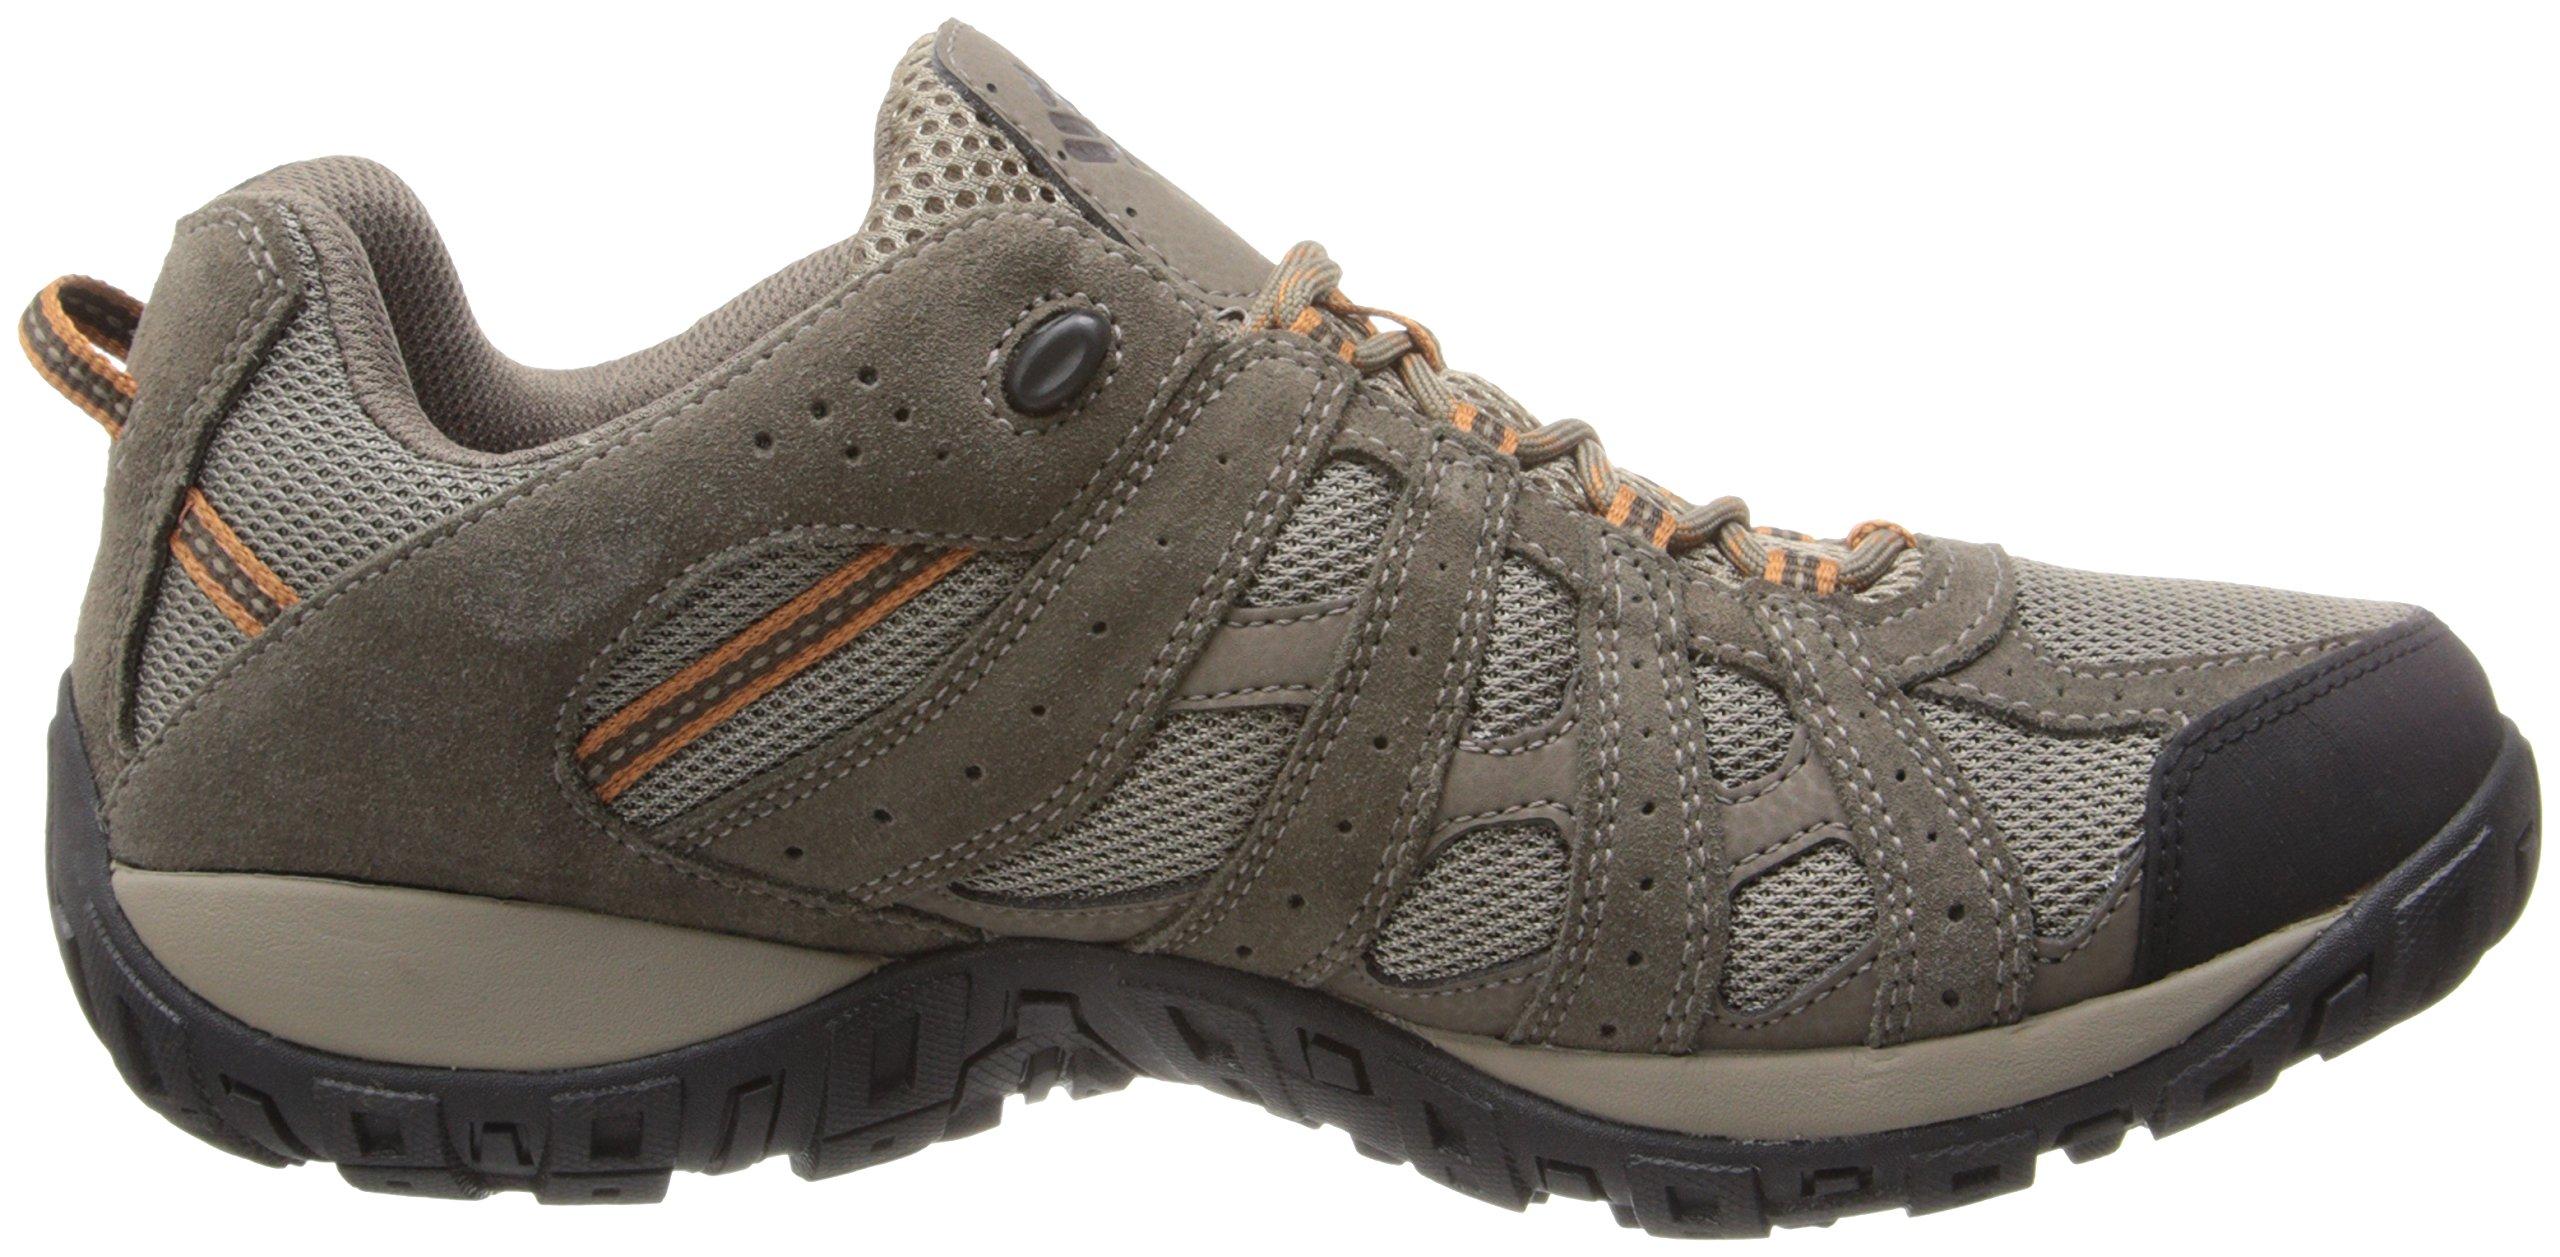 Columbia Men's Redmond Waterproof Hiking Shoe Pebble, Dark Ginger 7 D US by Columbia (Image #7)